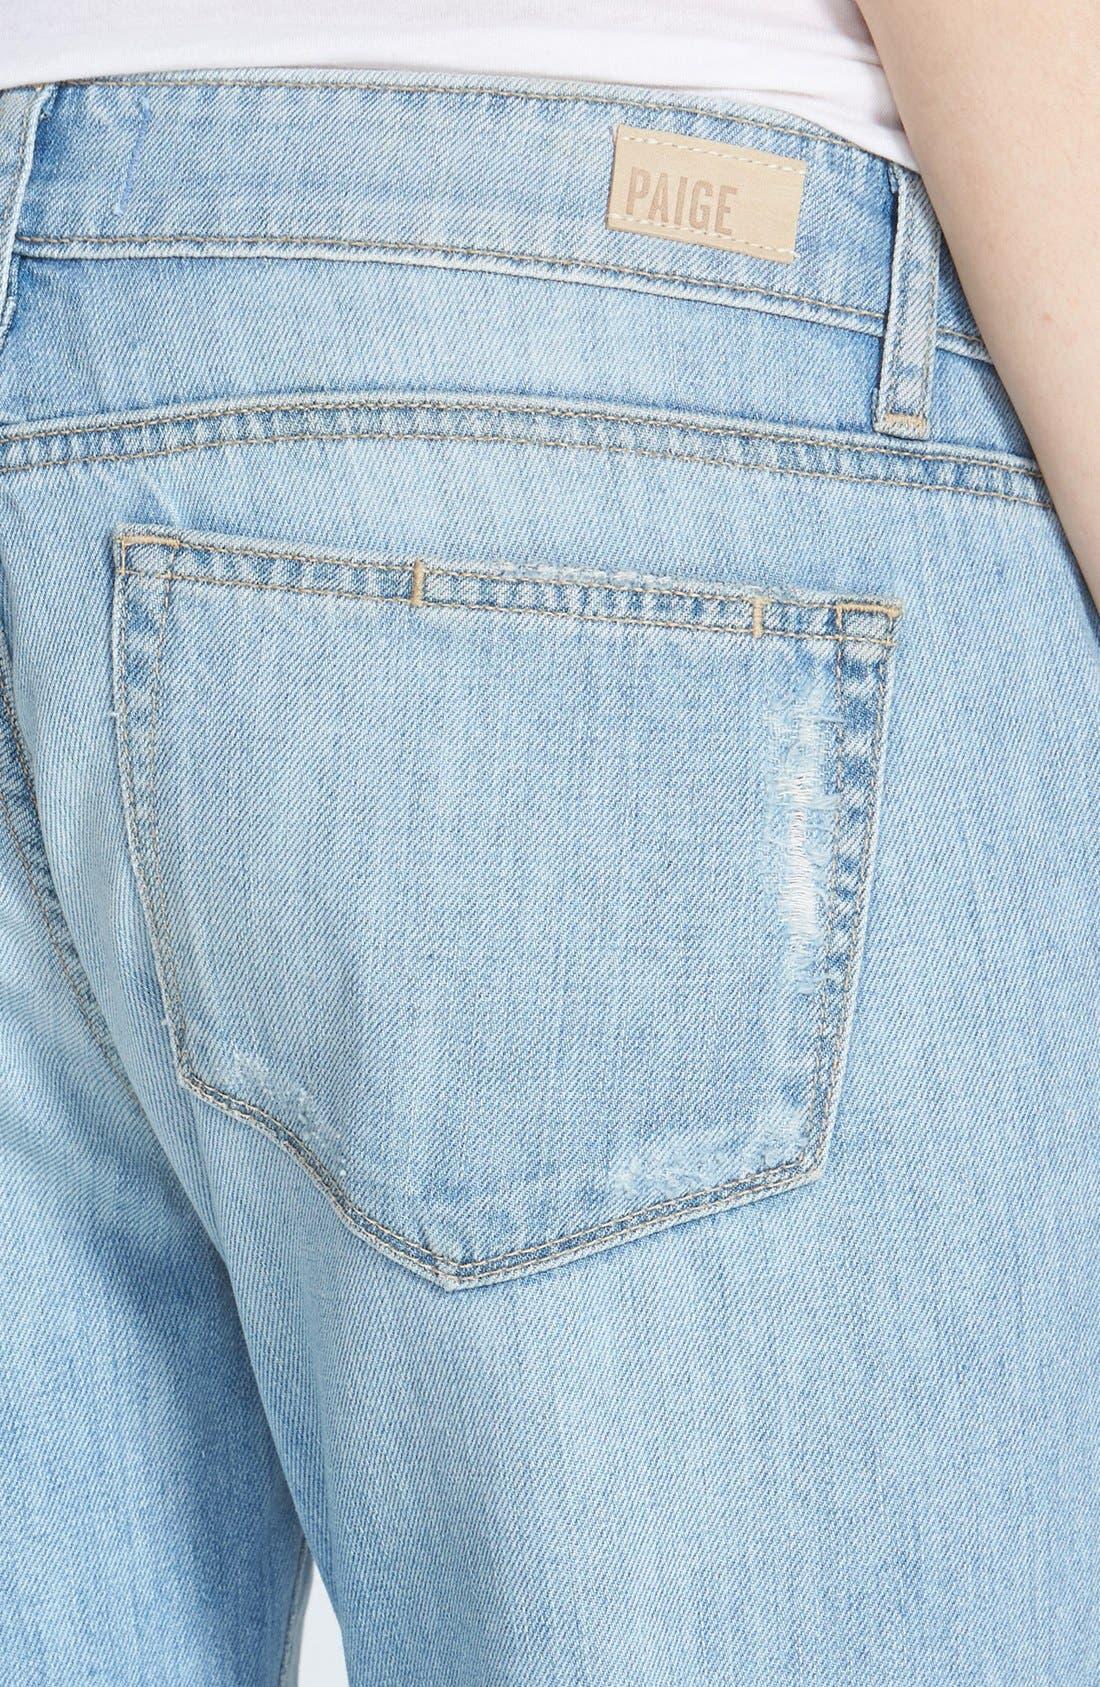 Alternate Image 3  - Paige Denim 'Jimmy Jimmy' Destroyed Crop Boyfriend Jeans (Naomi Distressed)